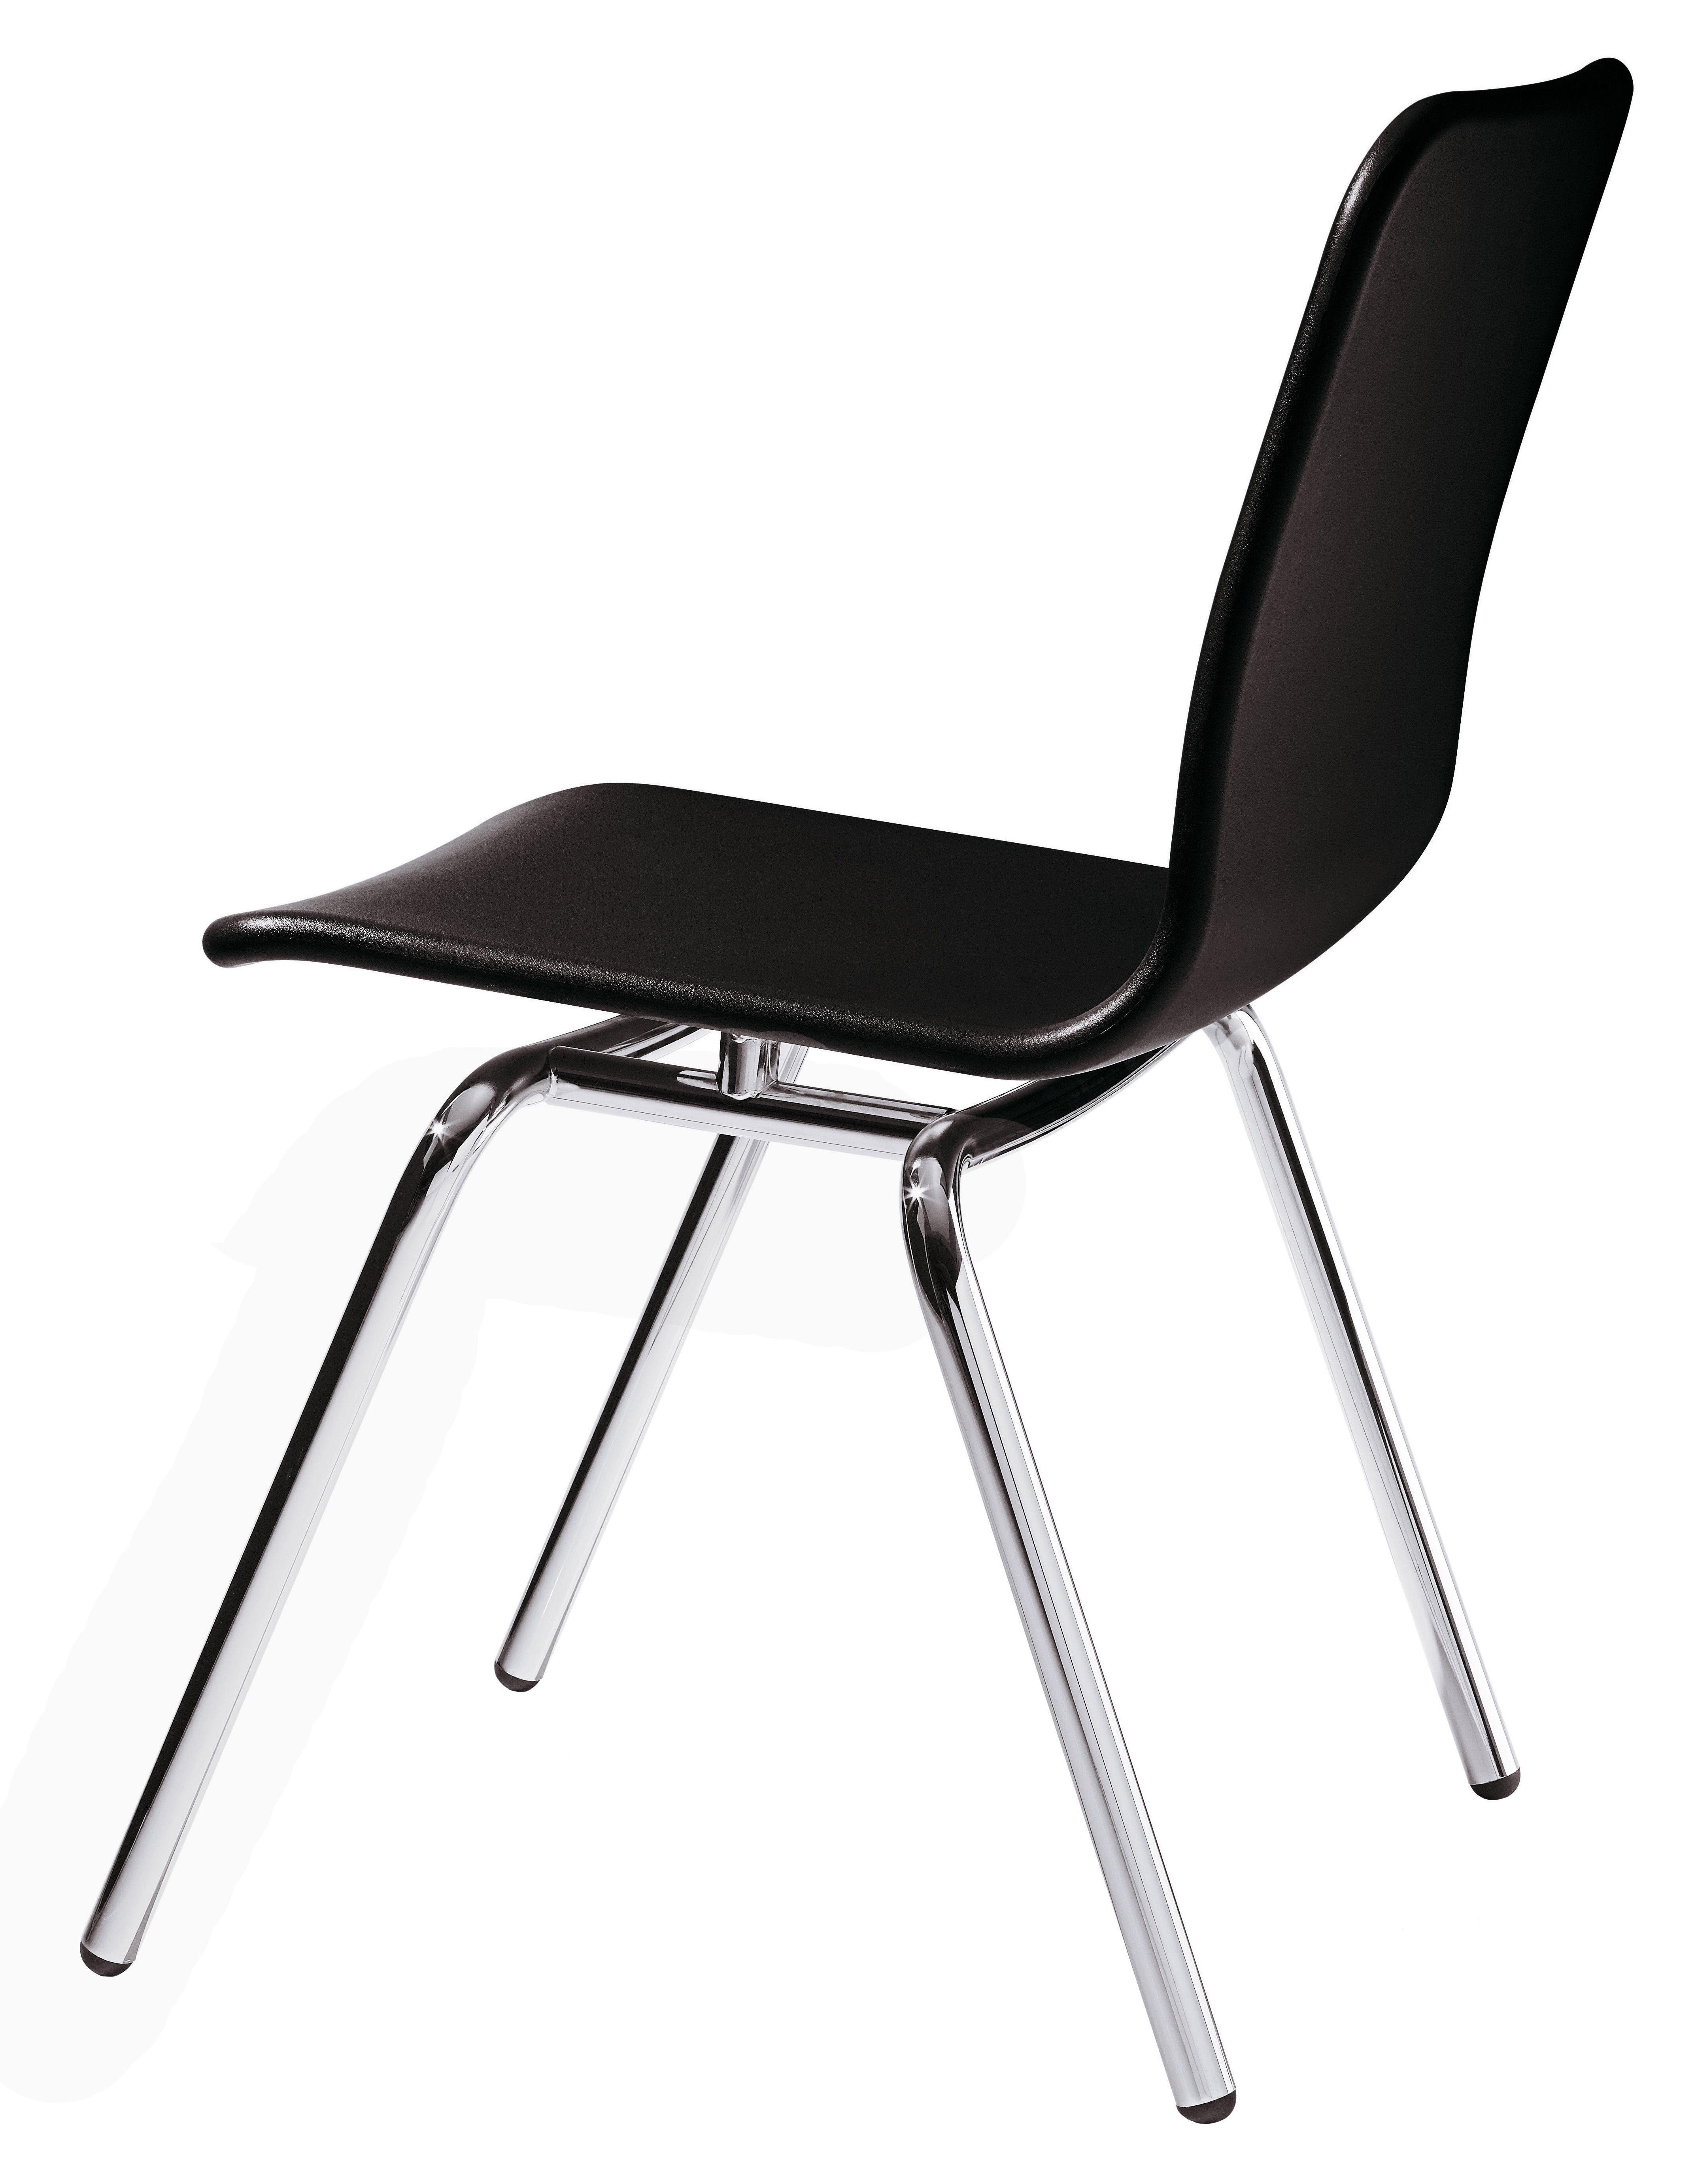 soho stackable chair plastic metal legs black by magis